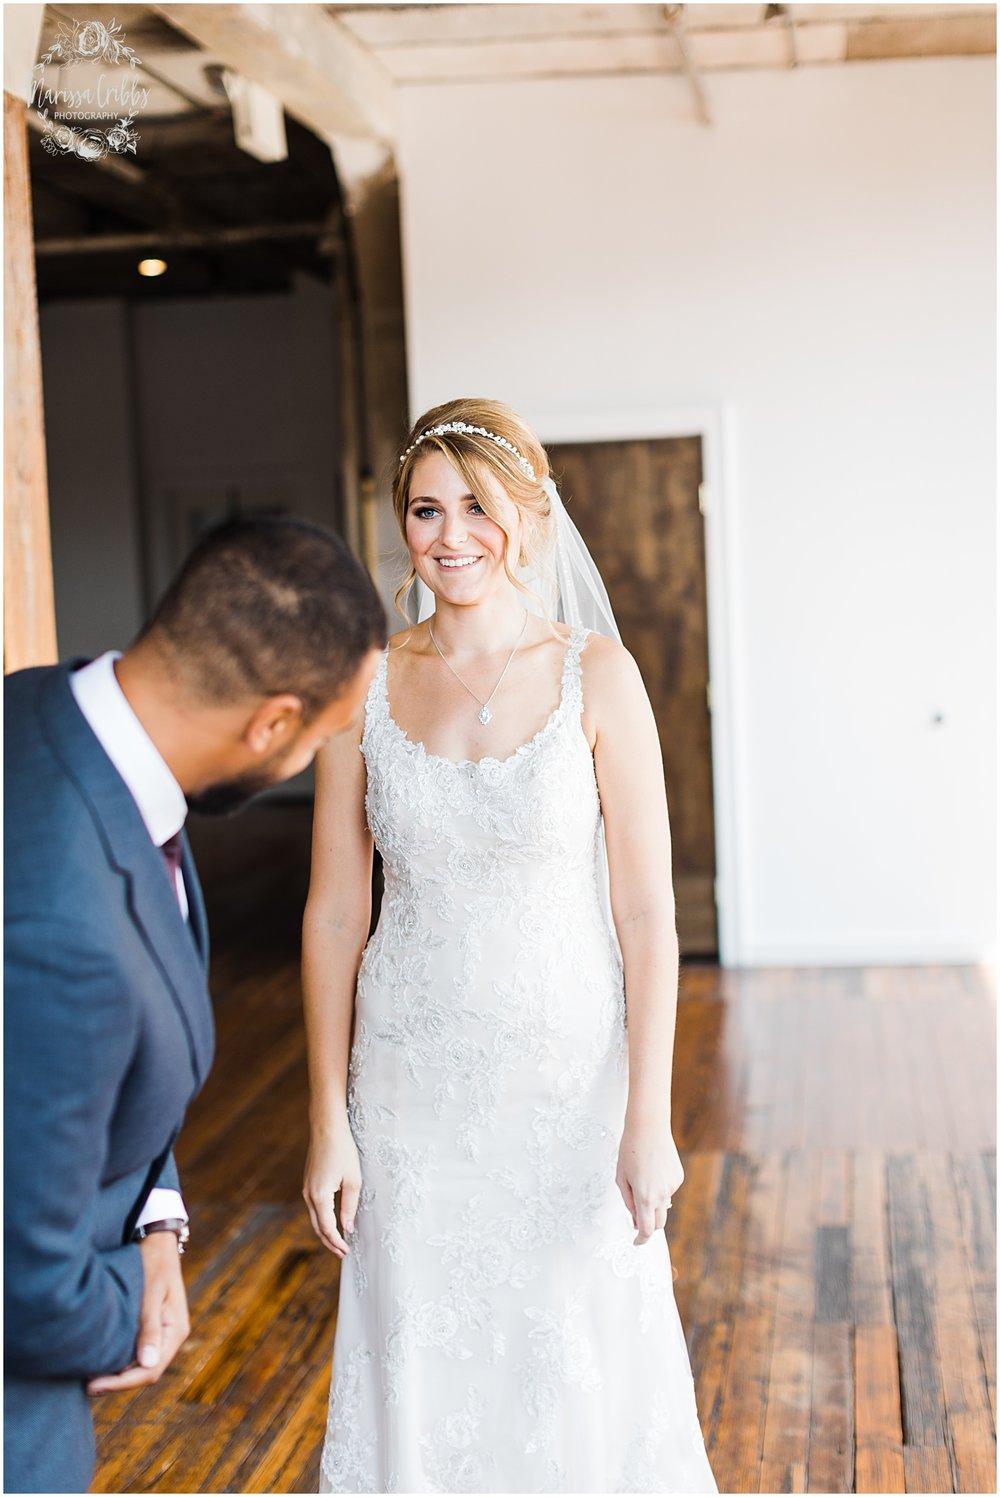 BAUER WEDDING   KELSEA & JUSTIN   MARISSA CRIBBS PHOTOGRAPHY_6505.jpg